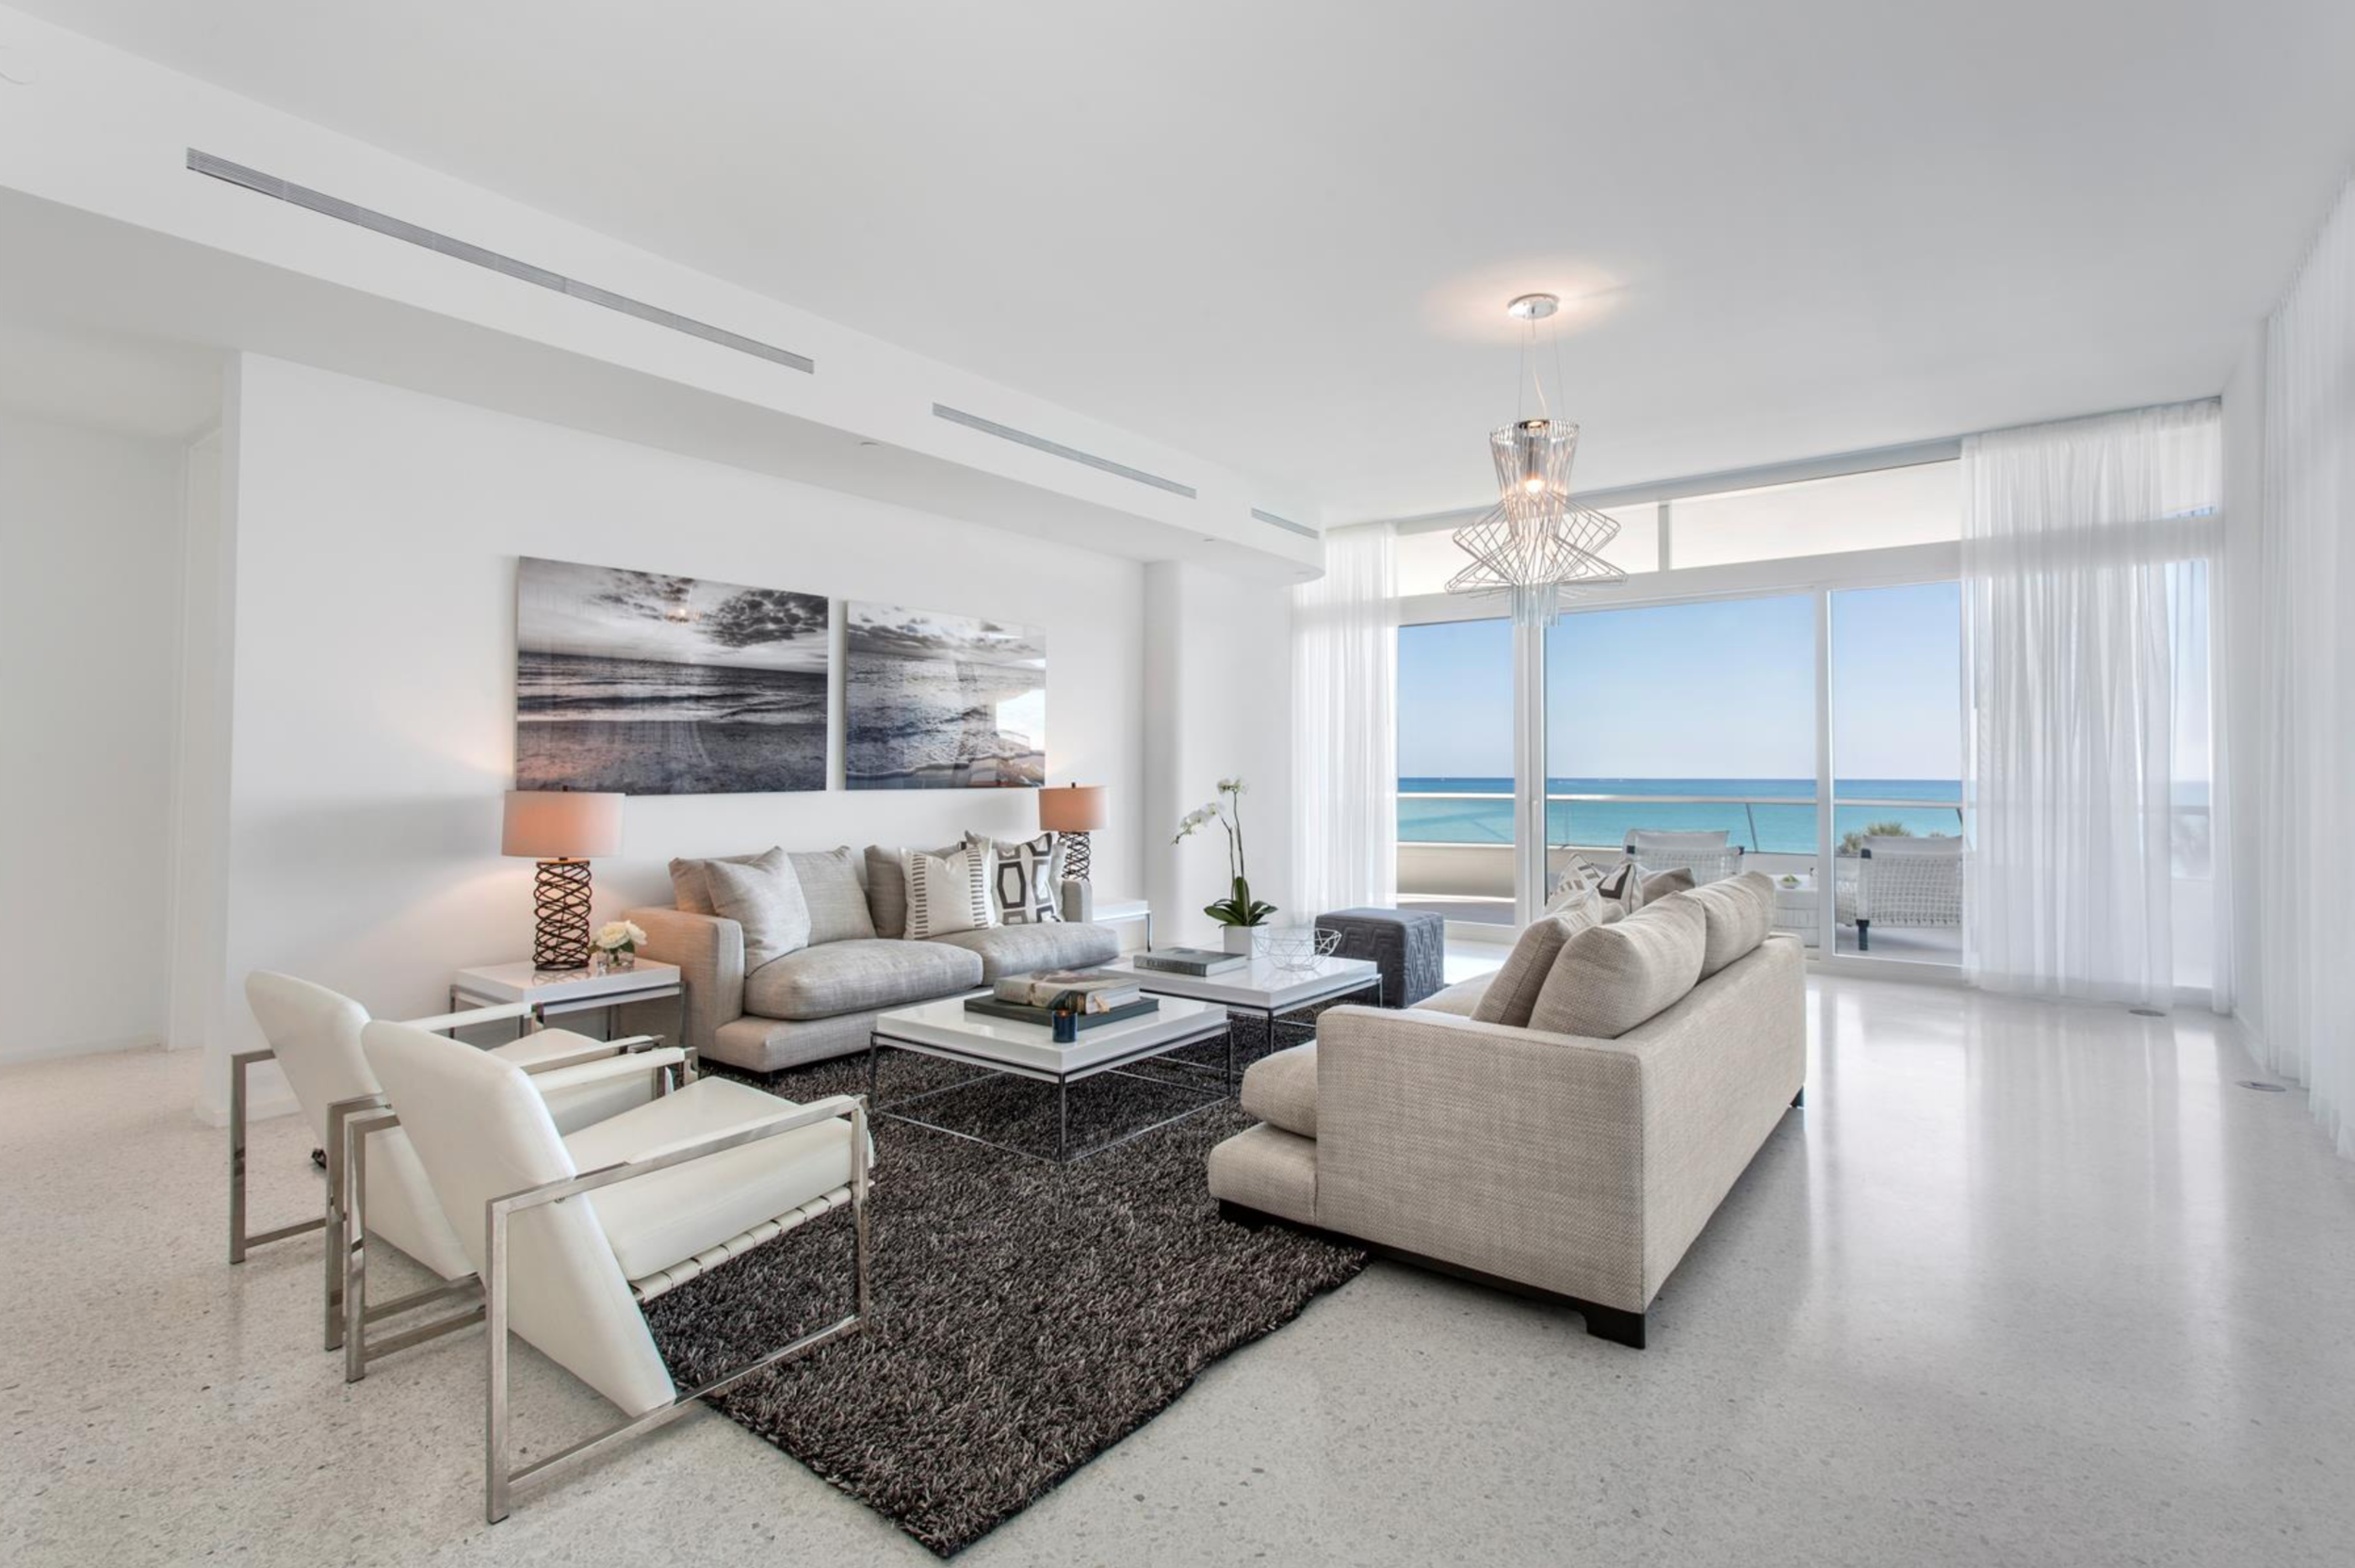 Featured Listing: Tour the Lavish Oceanfront Faena House Condo Asking $9.5 Million